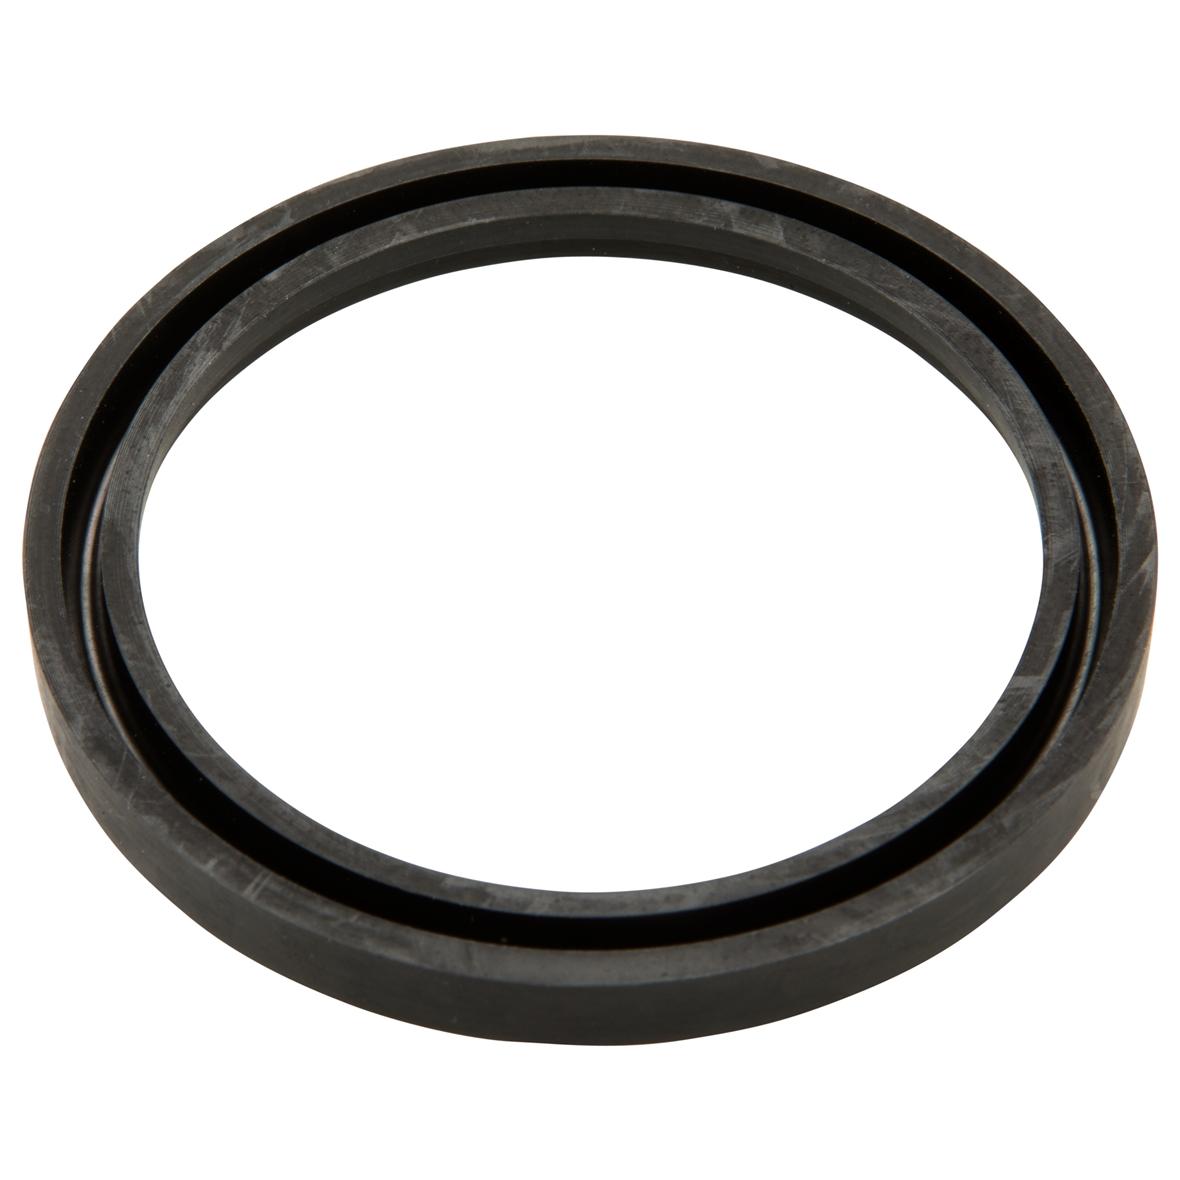 Product Image for 'Oil Seal CASA LAMBRETTA speedometer driveTitle'